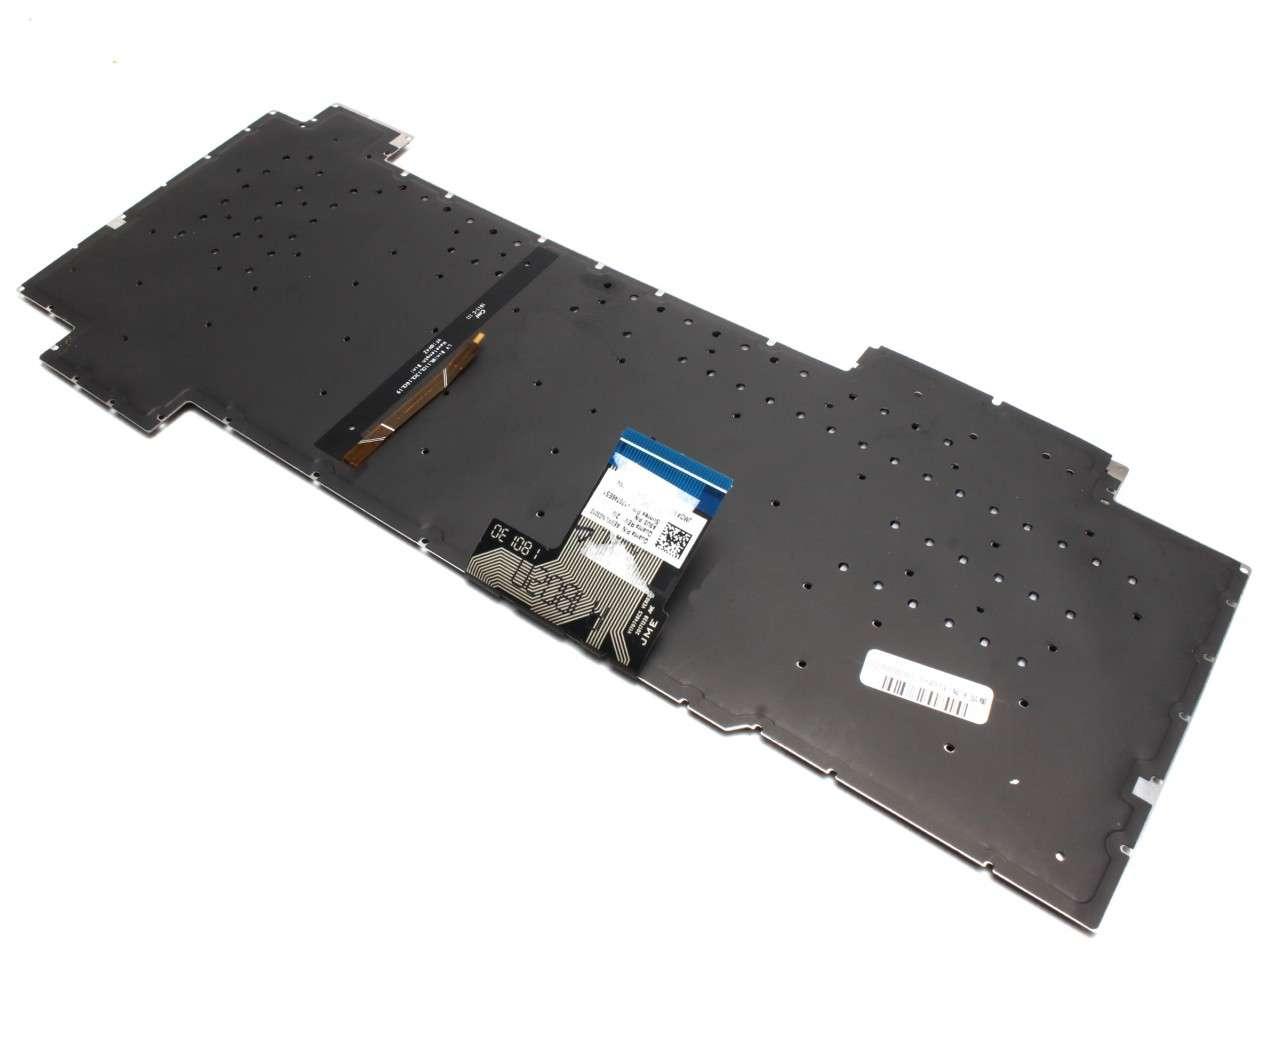 Tastatura neagra cu iluminare rosie pe marginea tastelor Asus TUF Gaming FX504GE-US52 iluminata layout US fara rama enter mic imagine powerlaptop.ro 2021